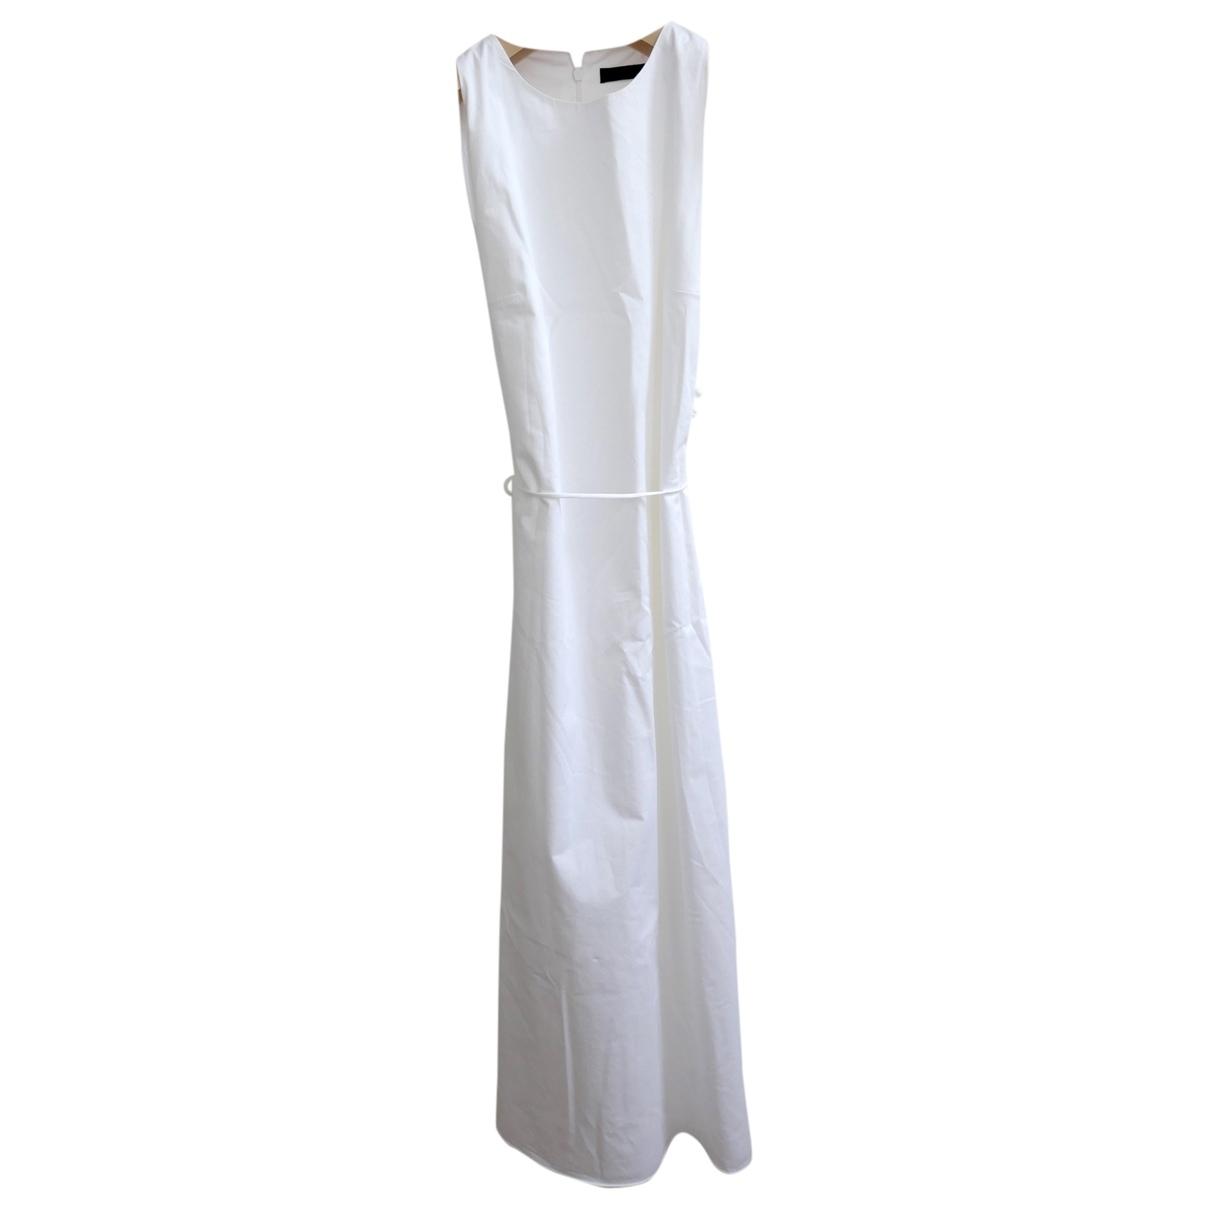 The Row \N White Cotton dress for Women 0 0-5